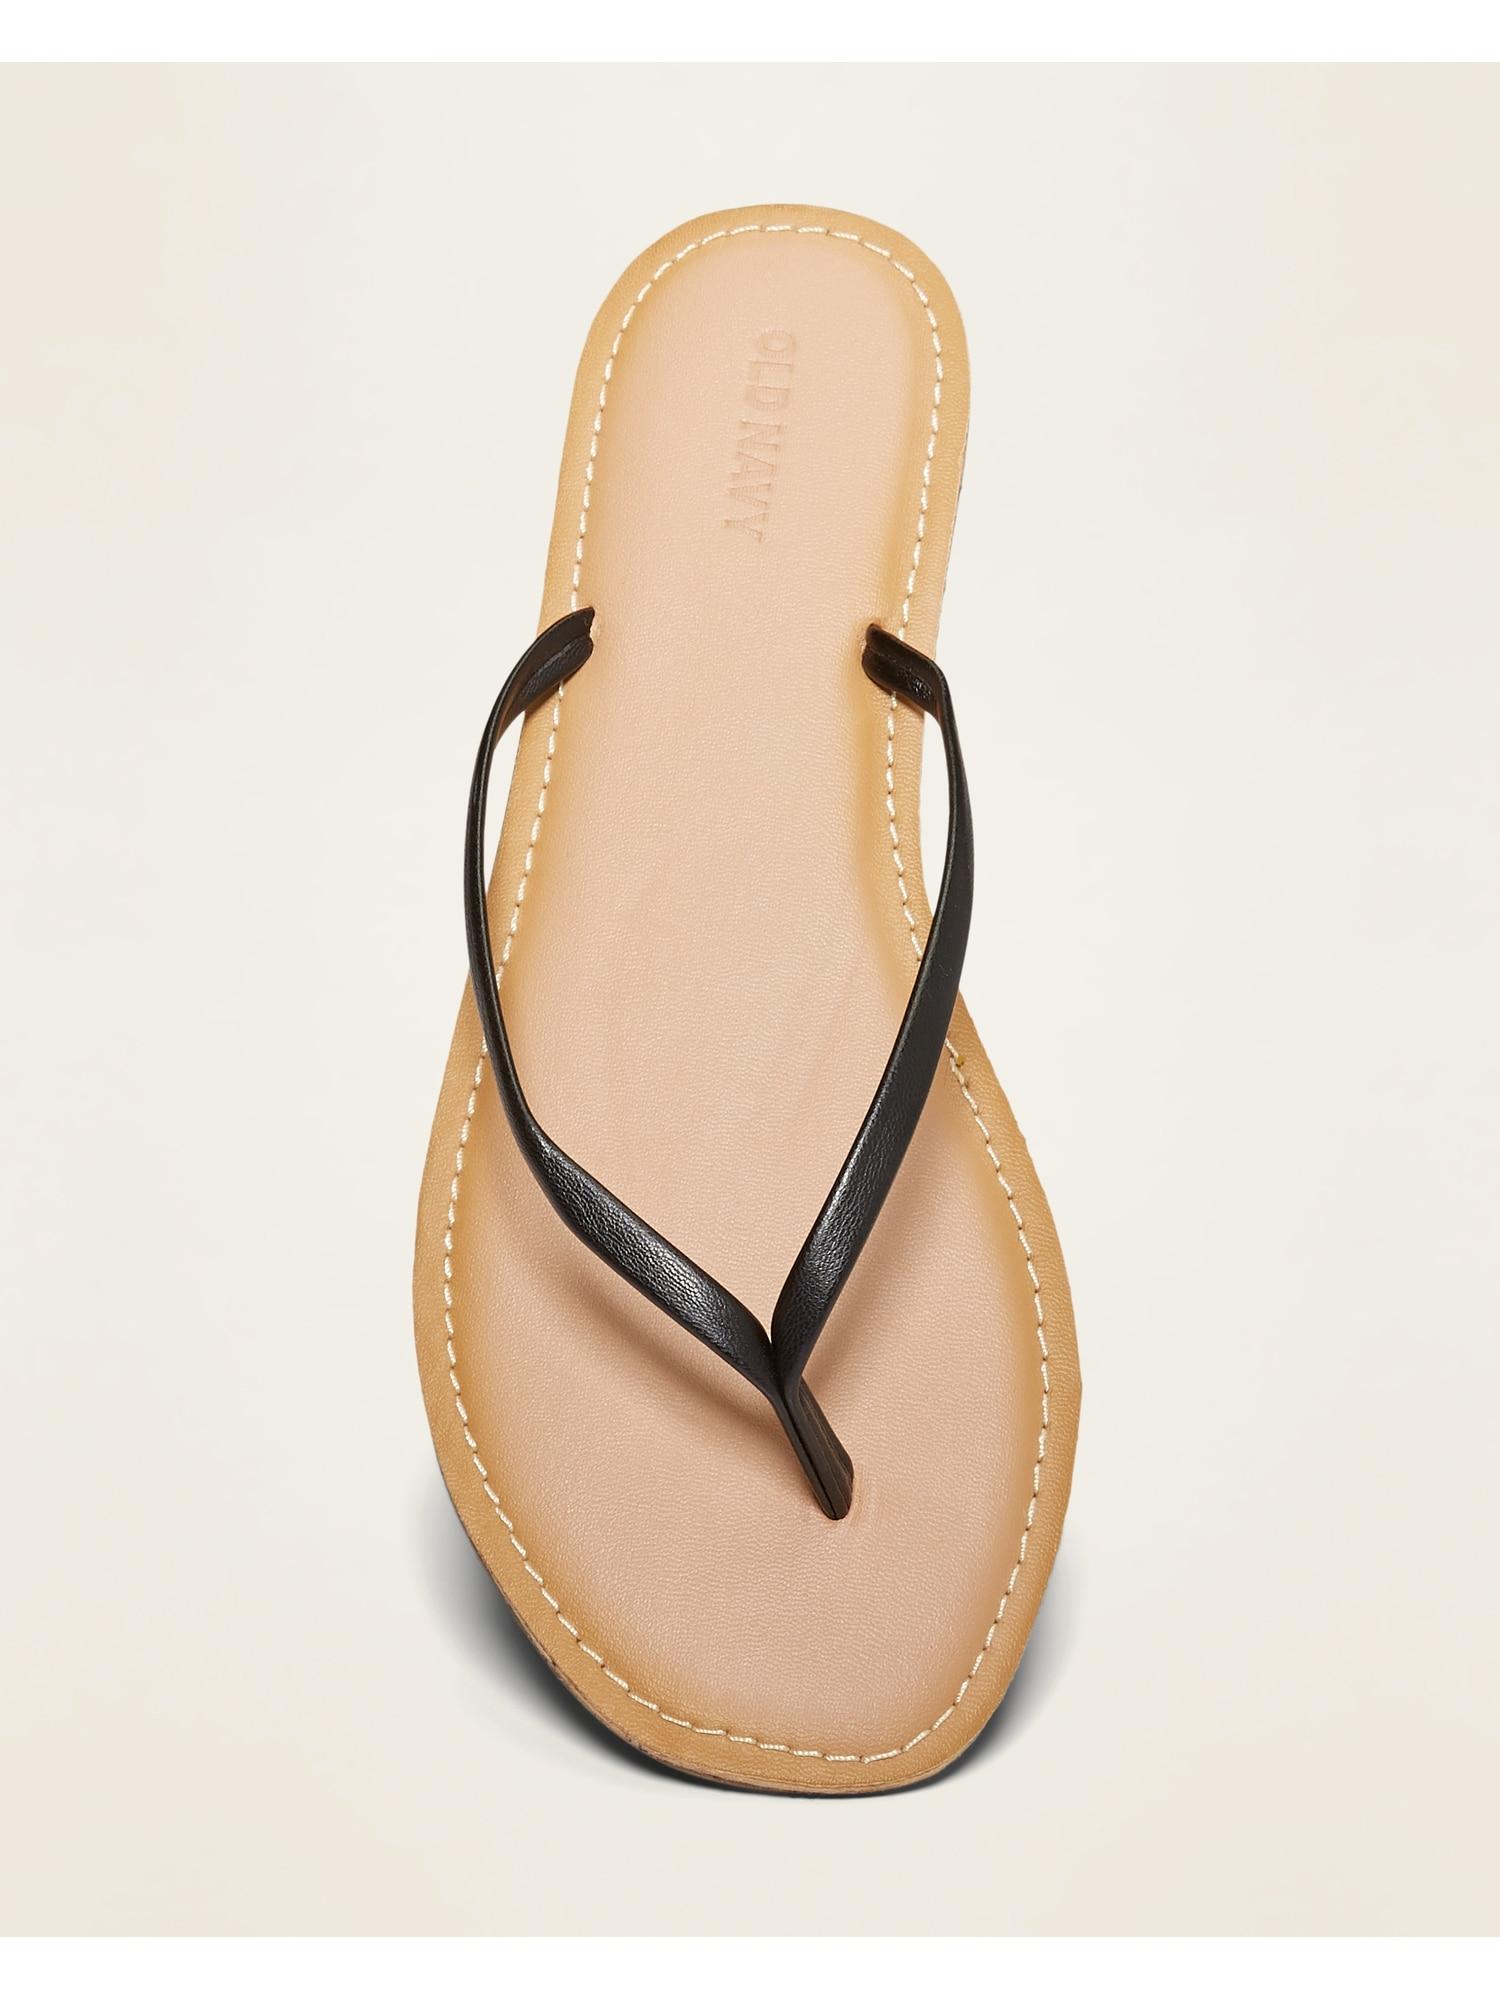 Size 7 Old Navy Faux Leather Capri Sandal